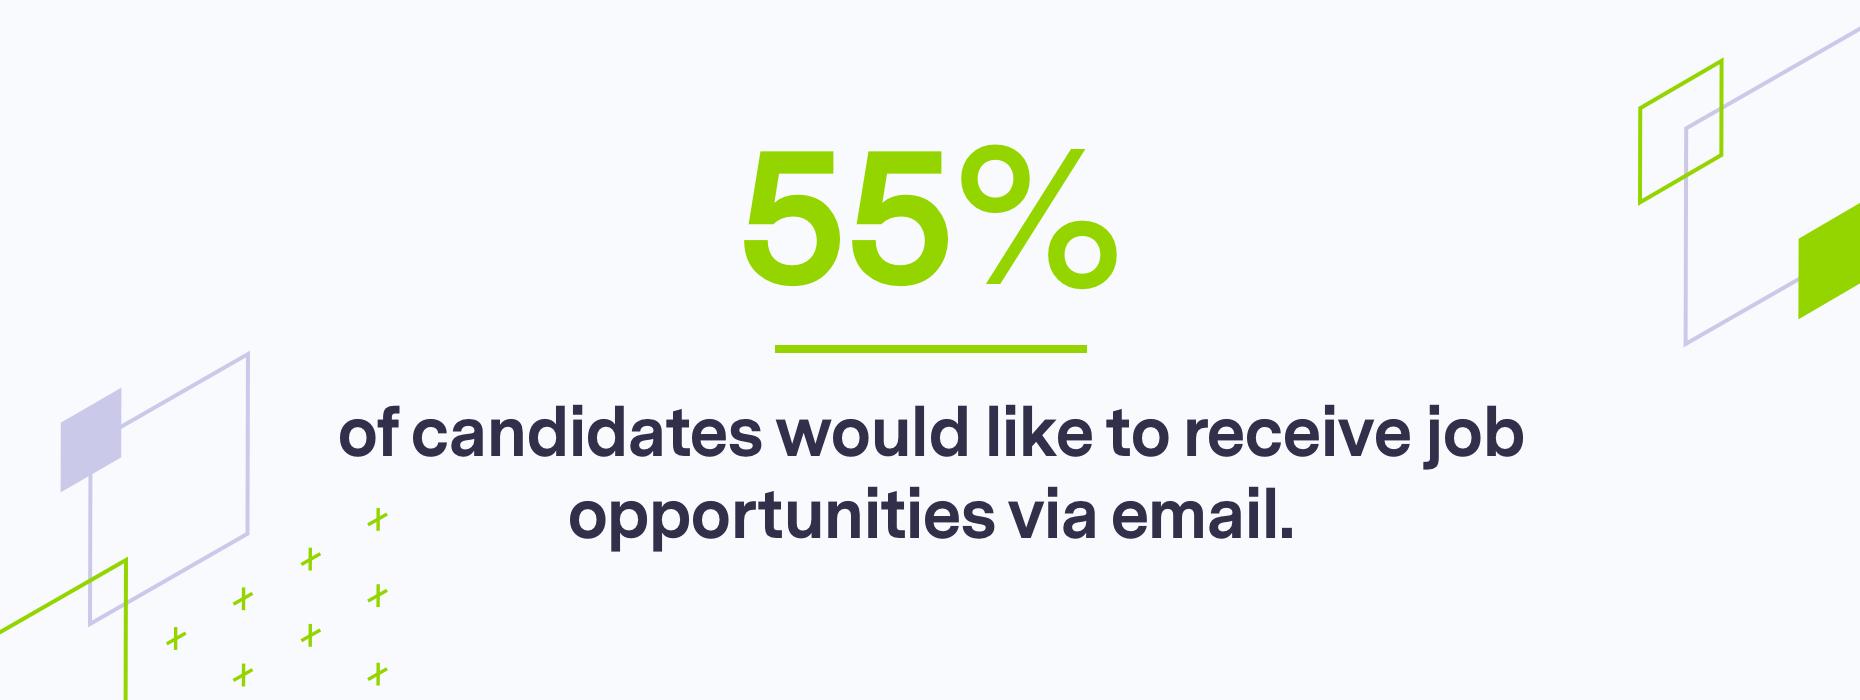 stats on candidate communication